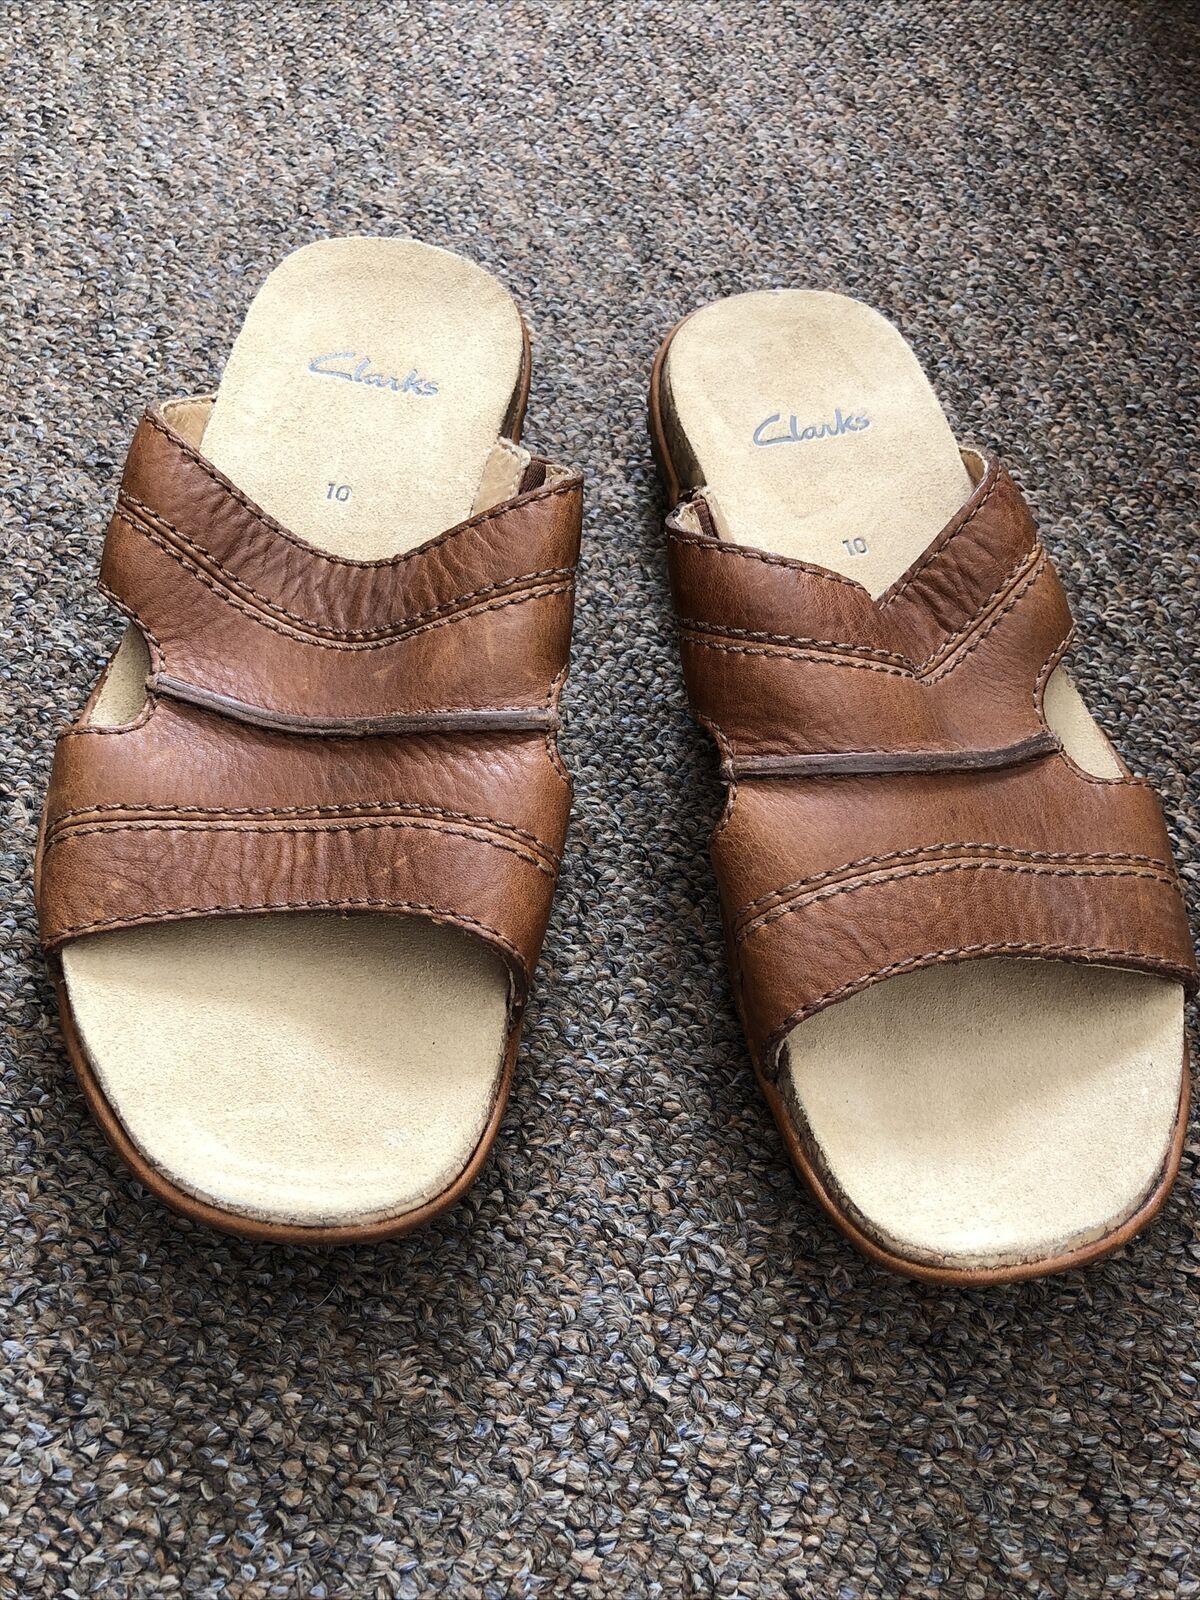 Clarks Mens Leather Sandals Size 10 G Standard Width